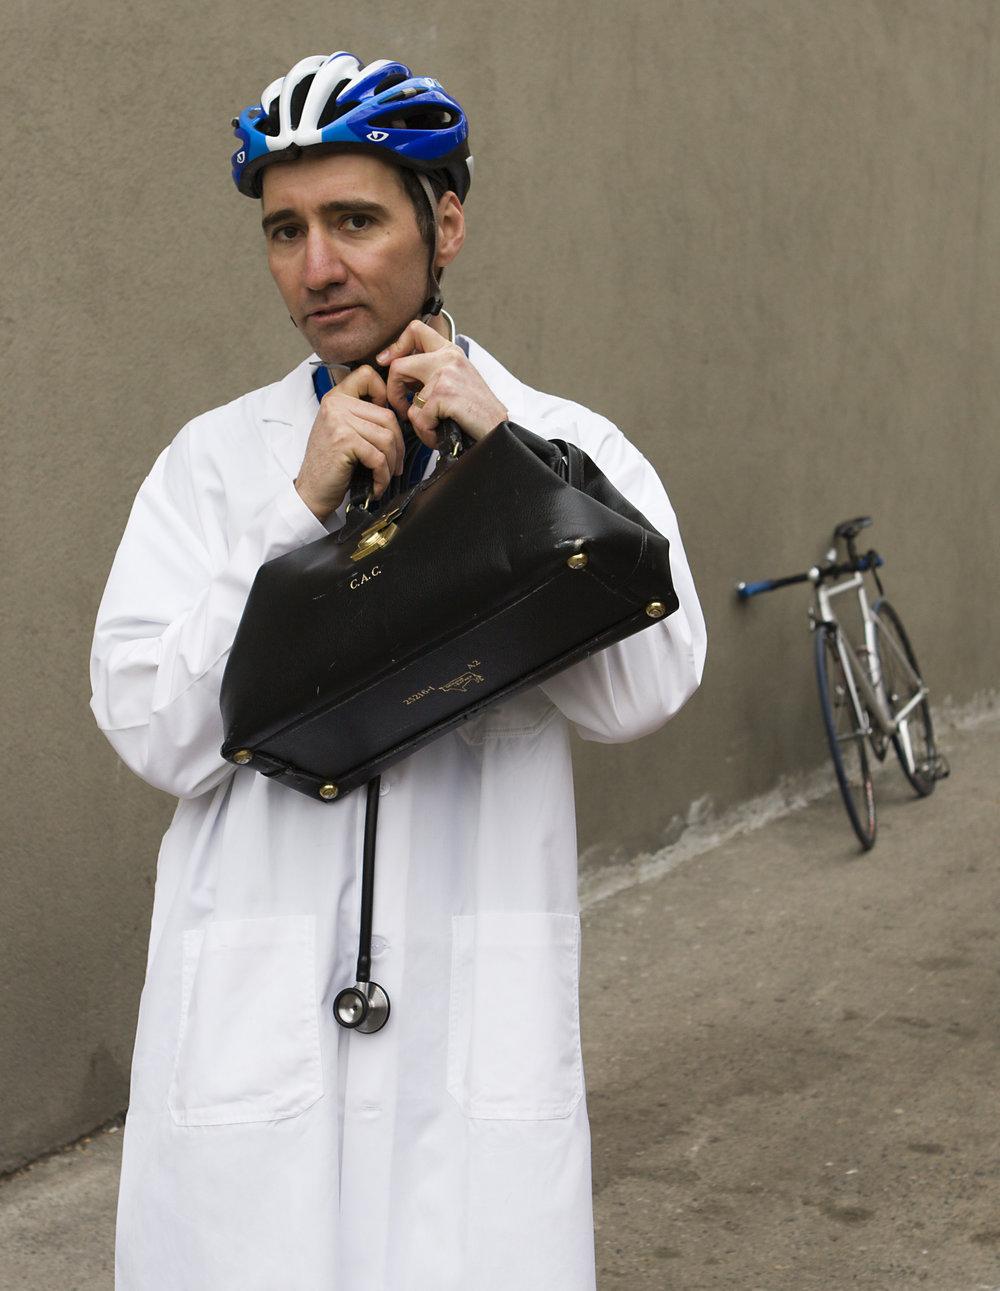 Dr. Chris Cavacuiti